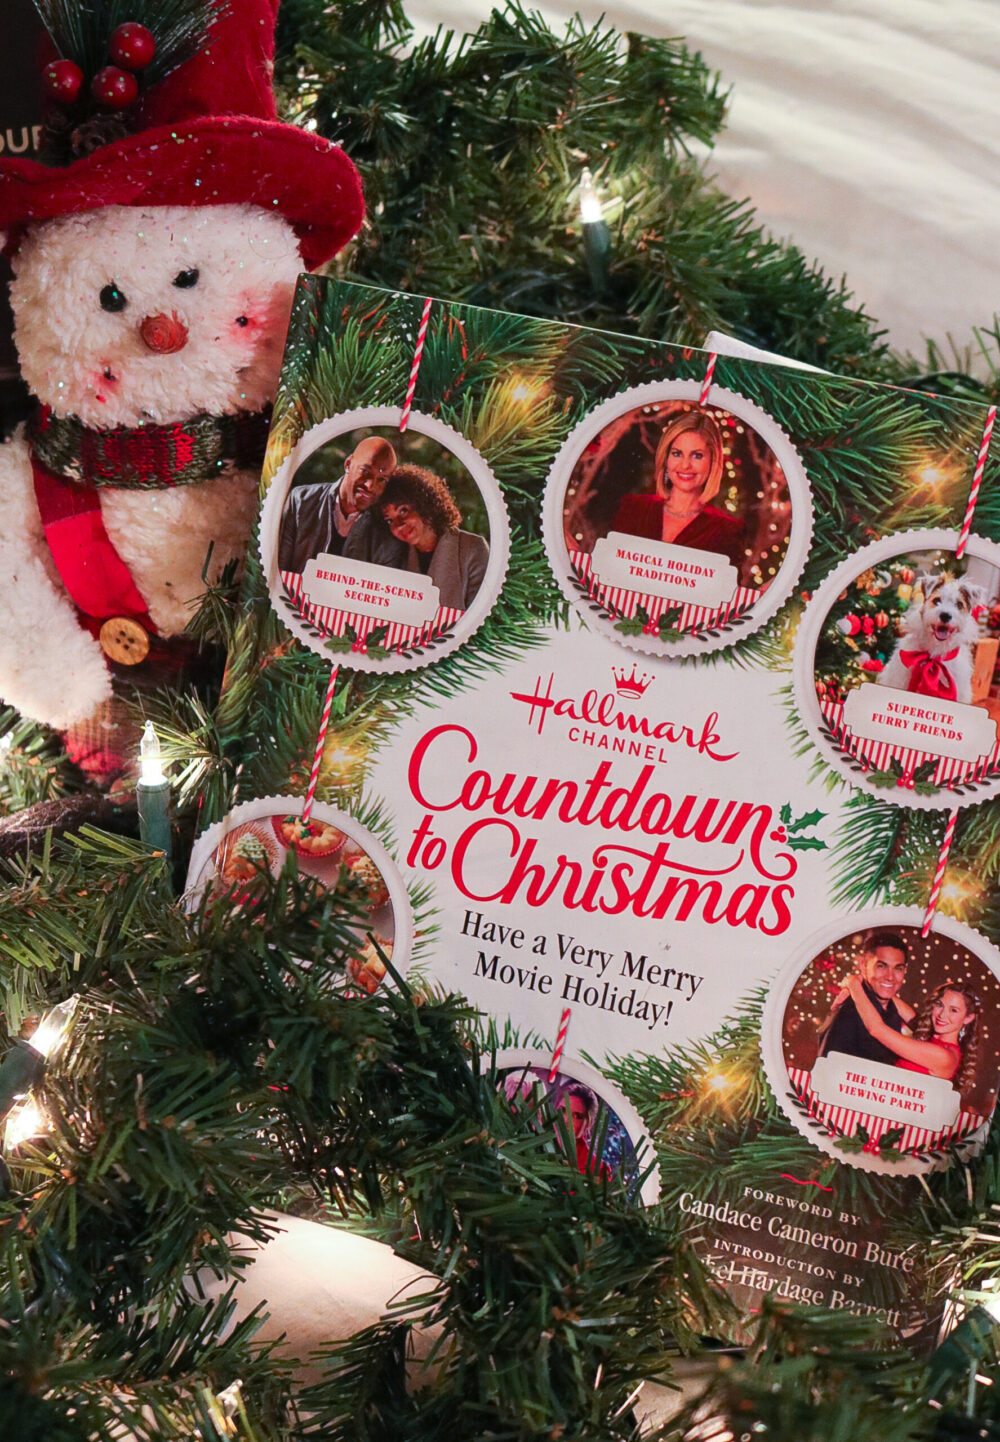 Festive Books to Read Over the Holidays I Hallmark Countdown to Christmas Book #CozyReads #FestiveVibes